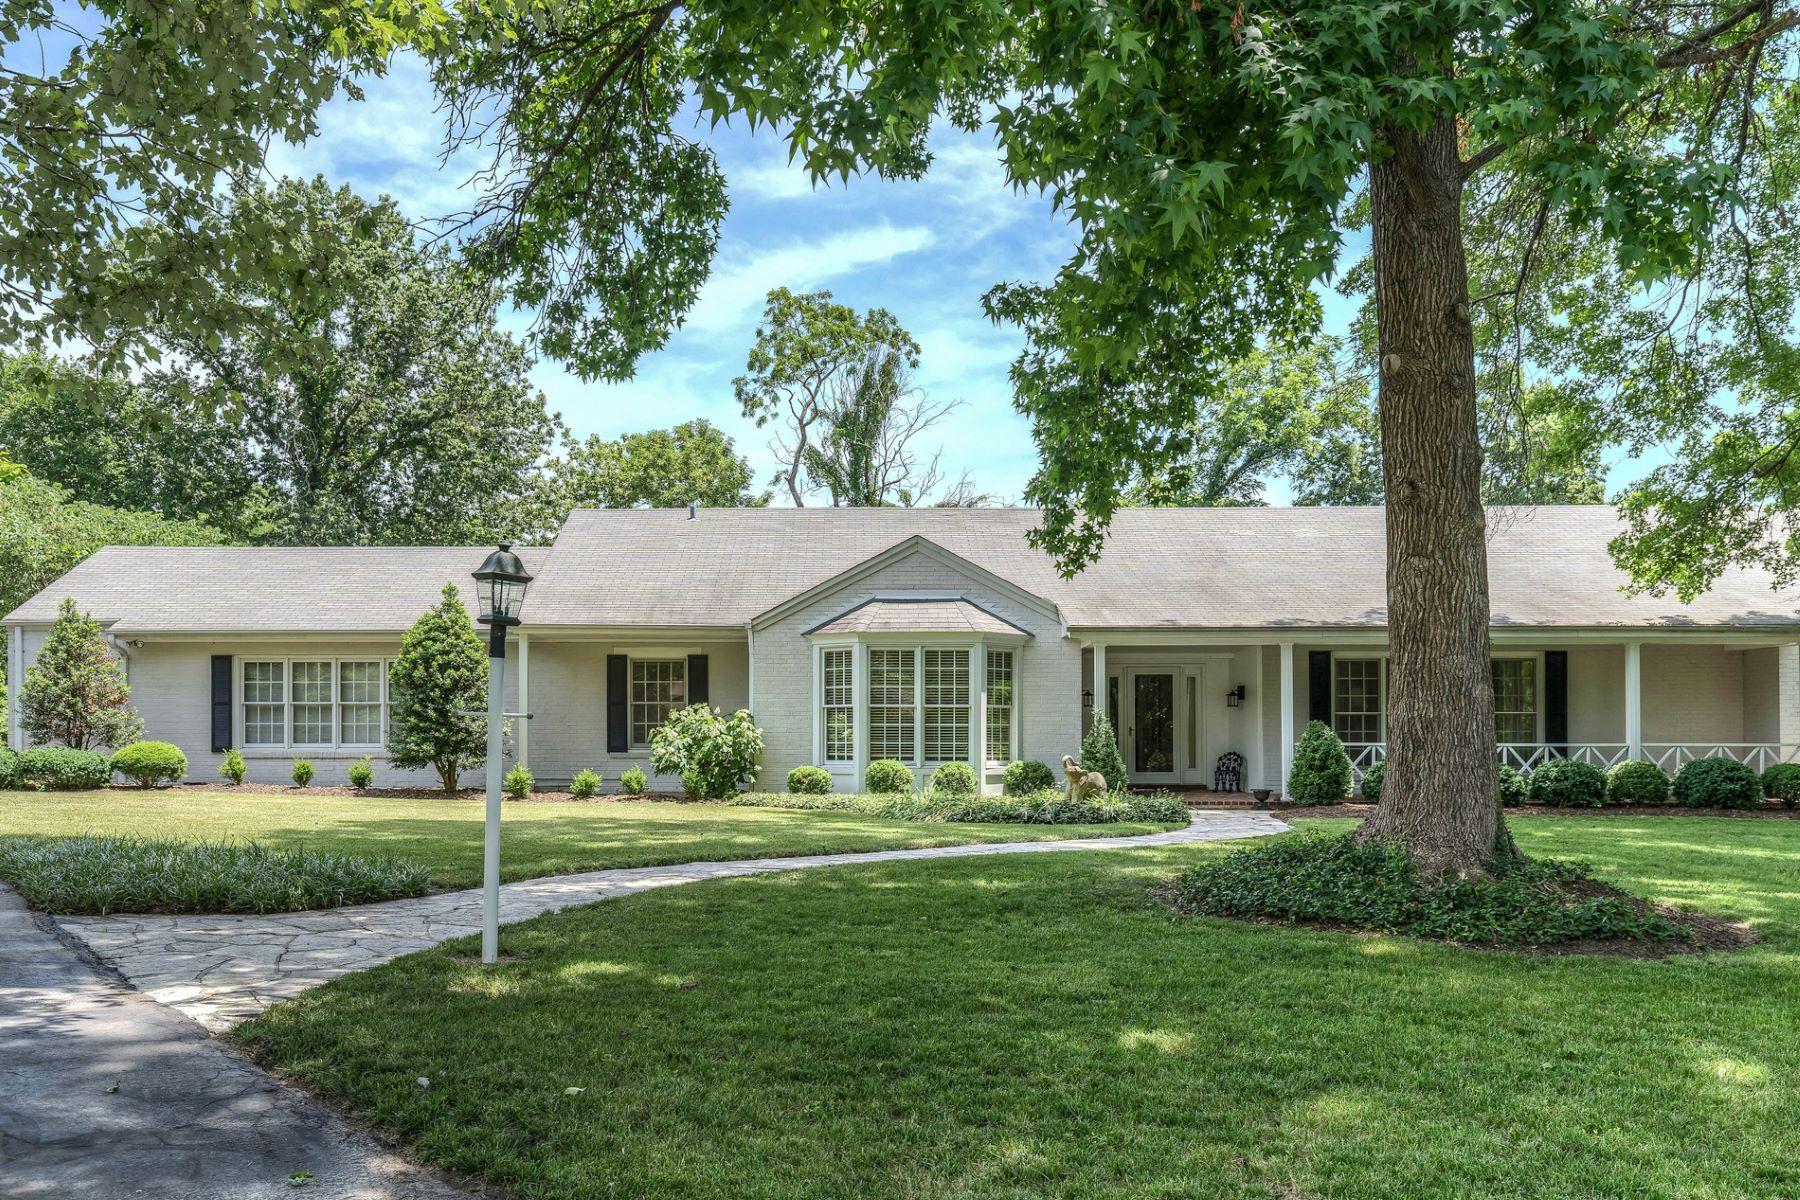 Single Family Home for Sale at Ladue Manor 18 Ladue Manor Ladue, Missouri 63124 United States